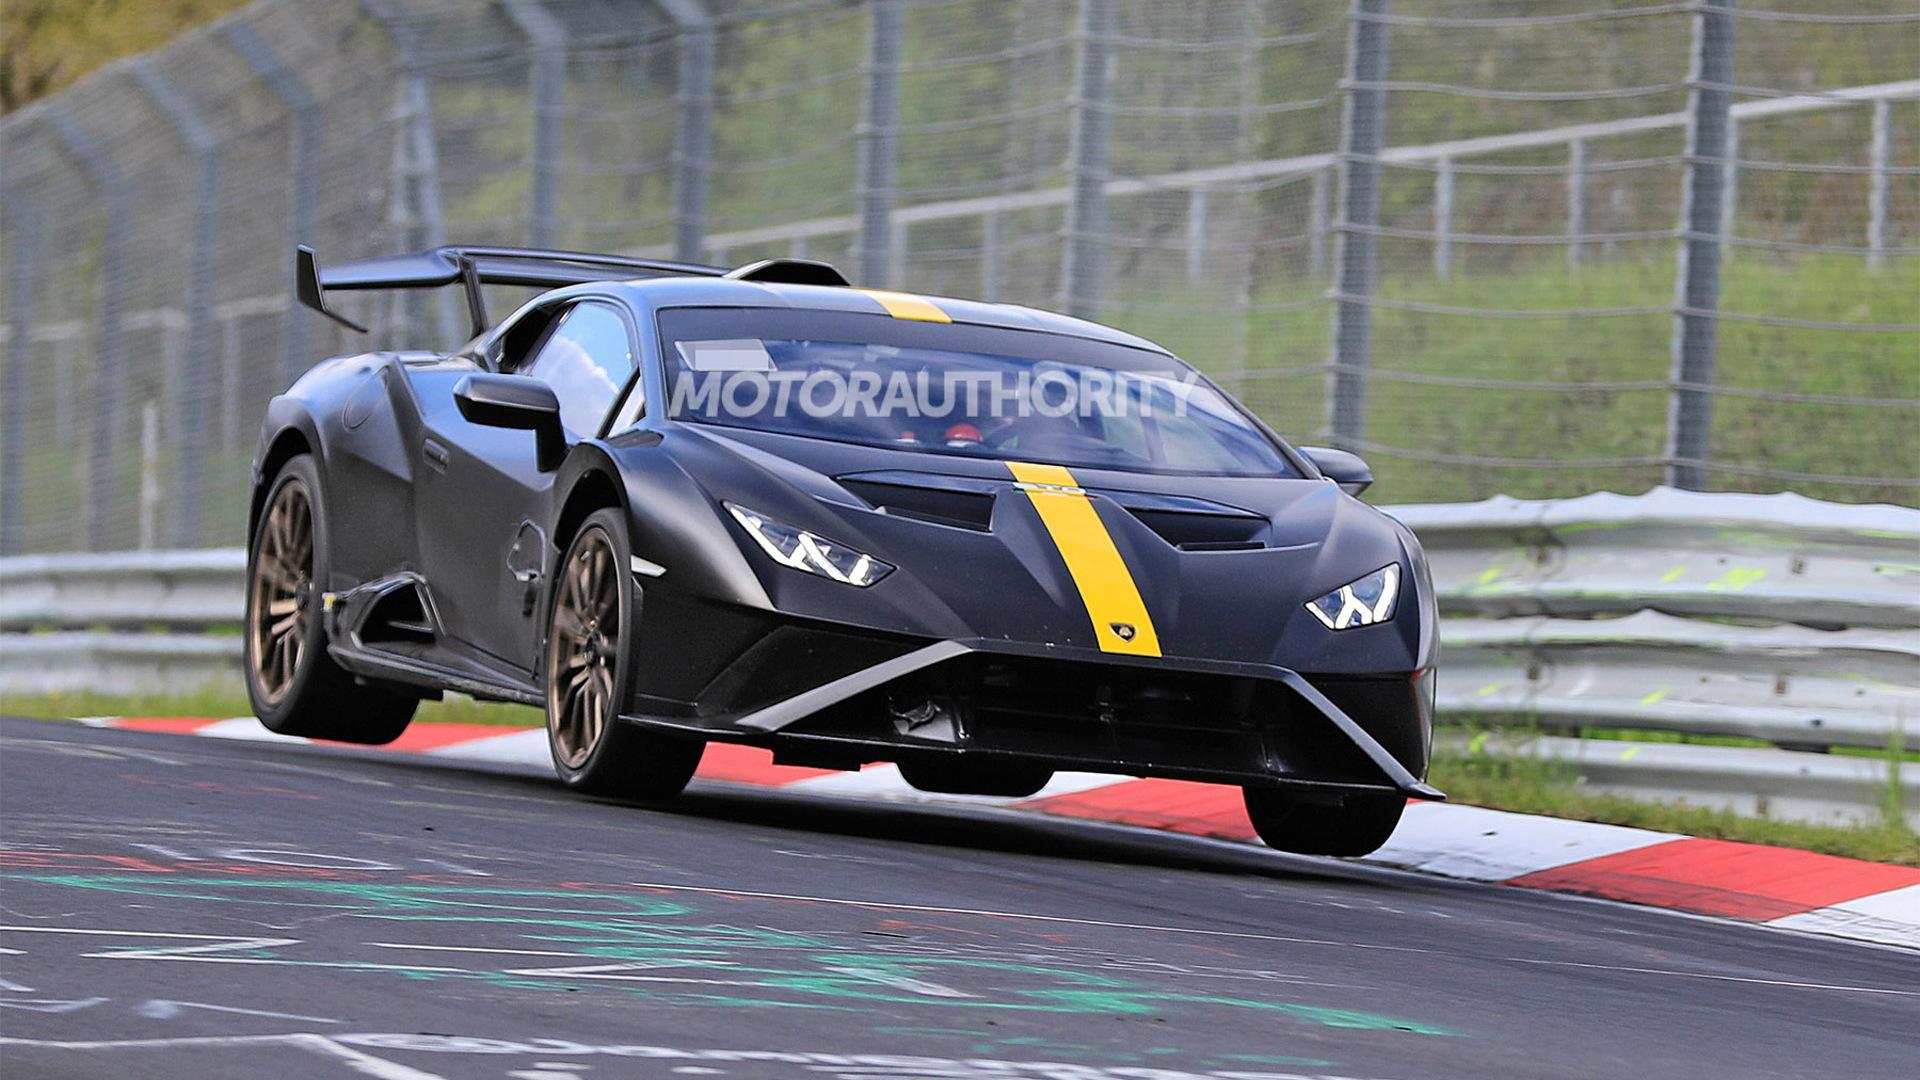 Lamborghini Huracan STO in likely Nürburgring record attempt - Photo credit:S. Baldauf/SB-Medien